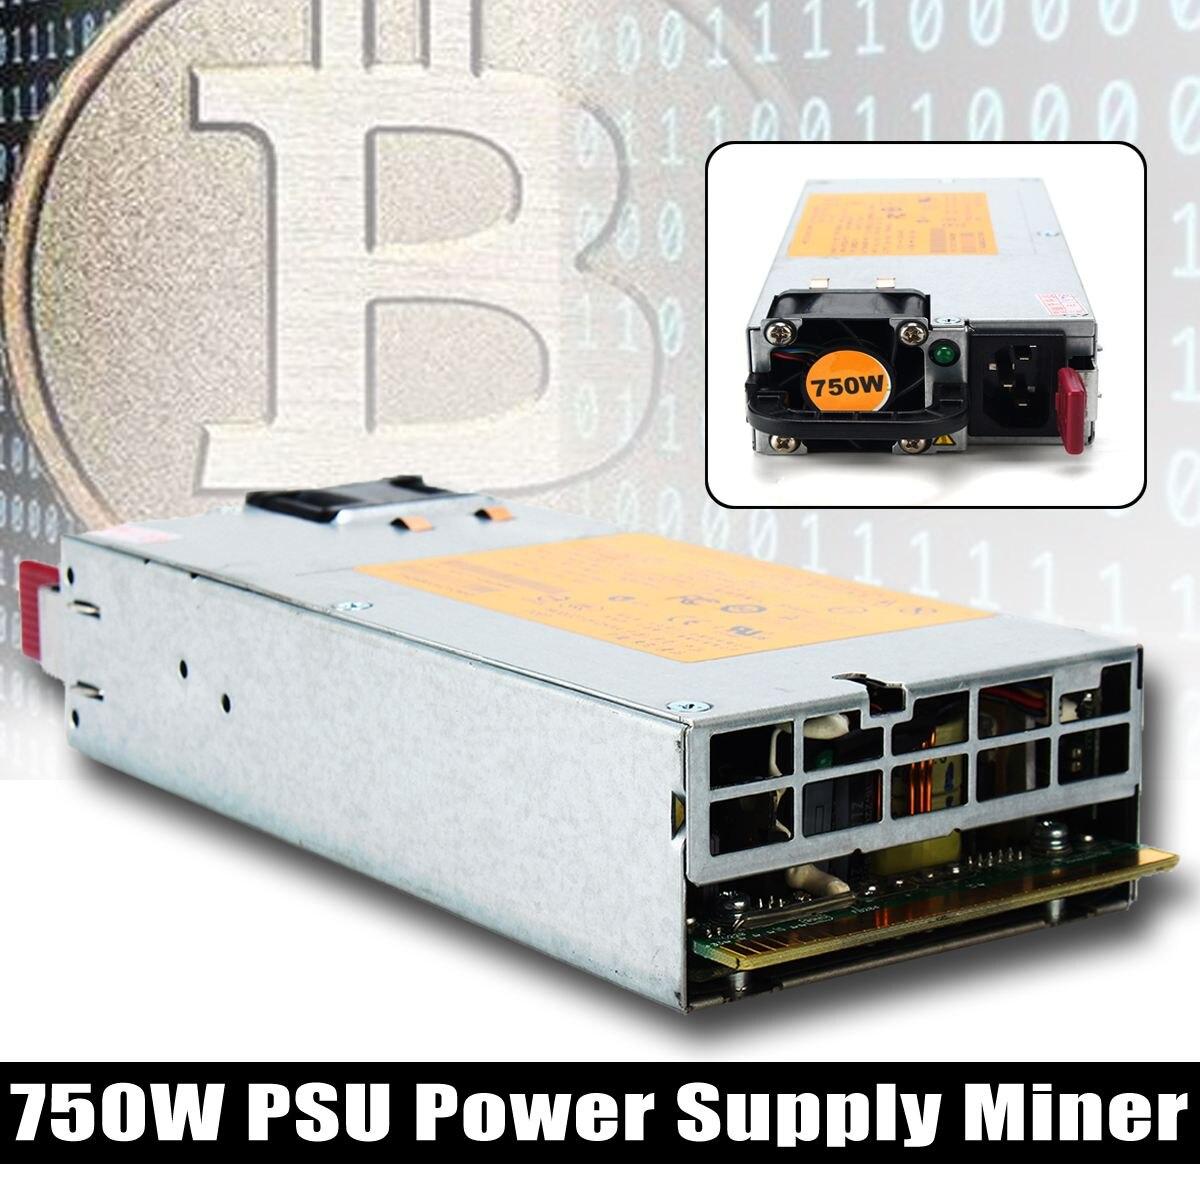 NEW Shark High Efficiency 750W PSU Mod for Bitmain Antminer S5 S3 S1 Mining Rig